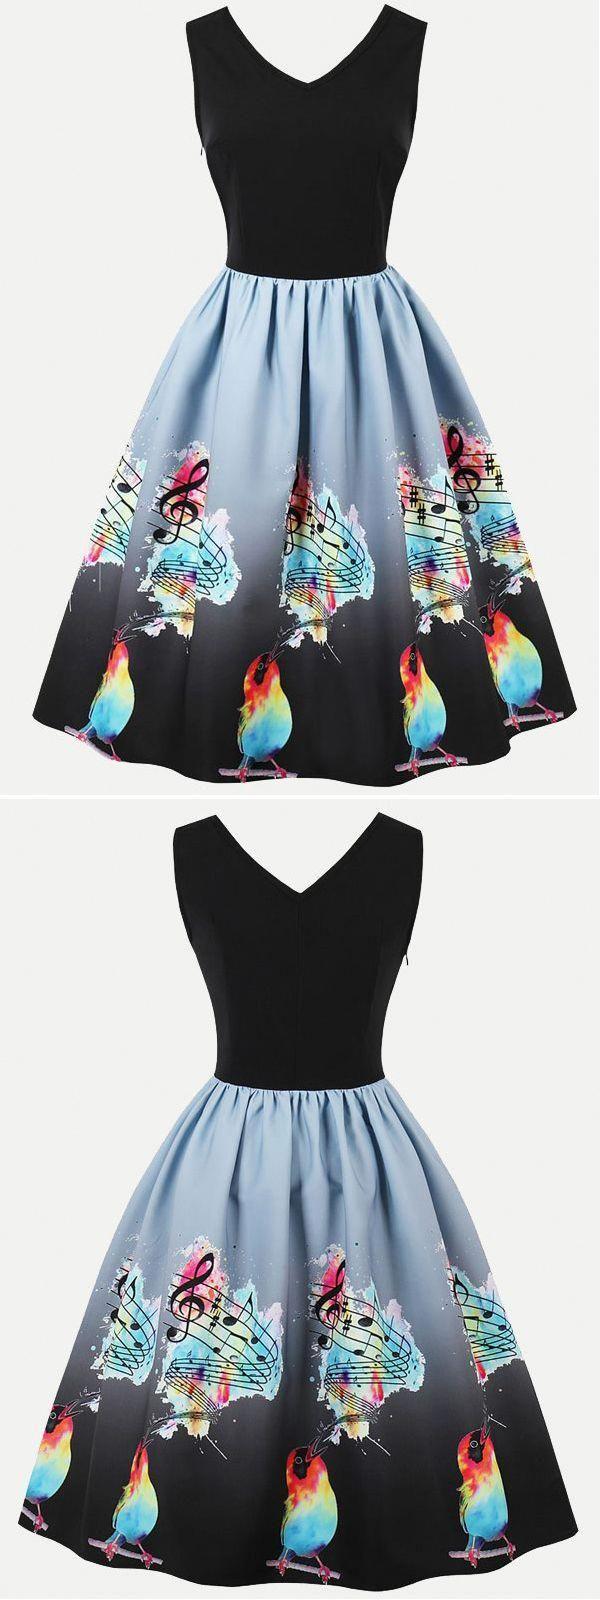 Vinfemass Retro Vneck Notes And Birds Printed Plus Size Skater Dress